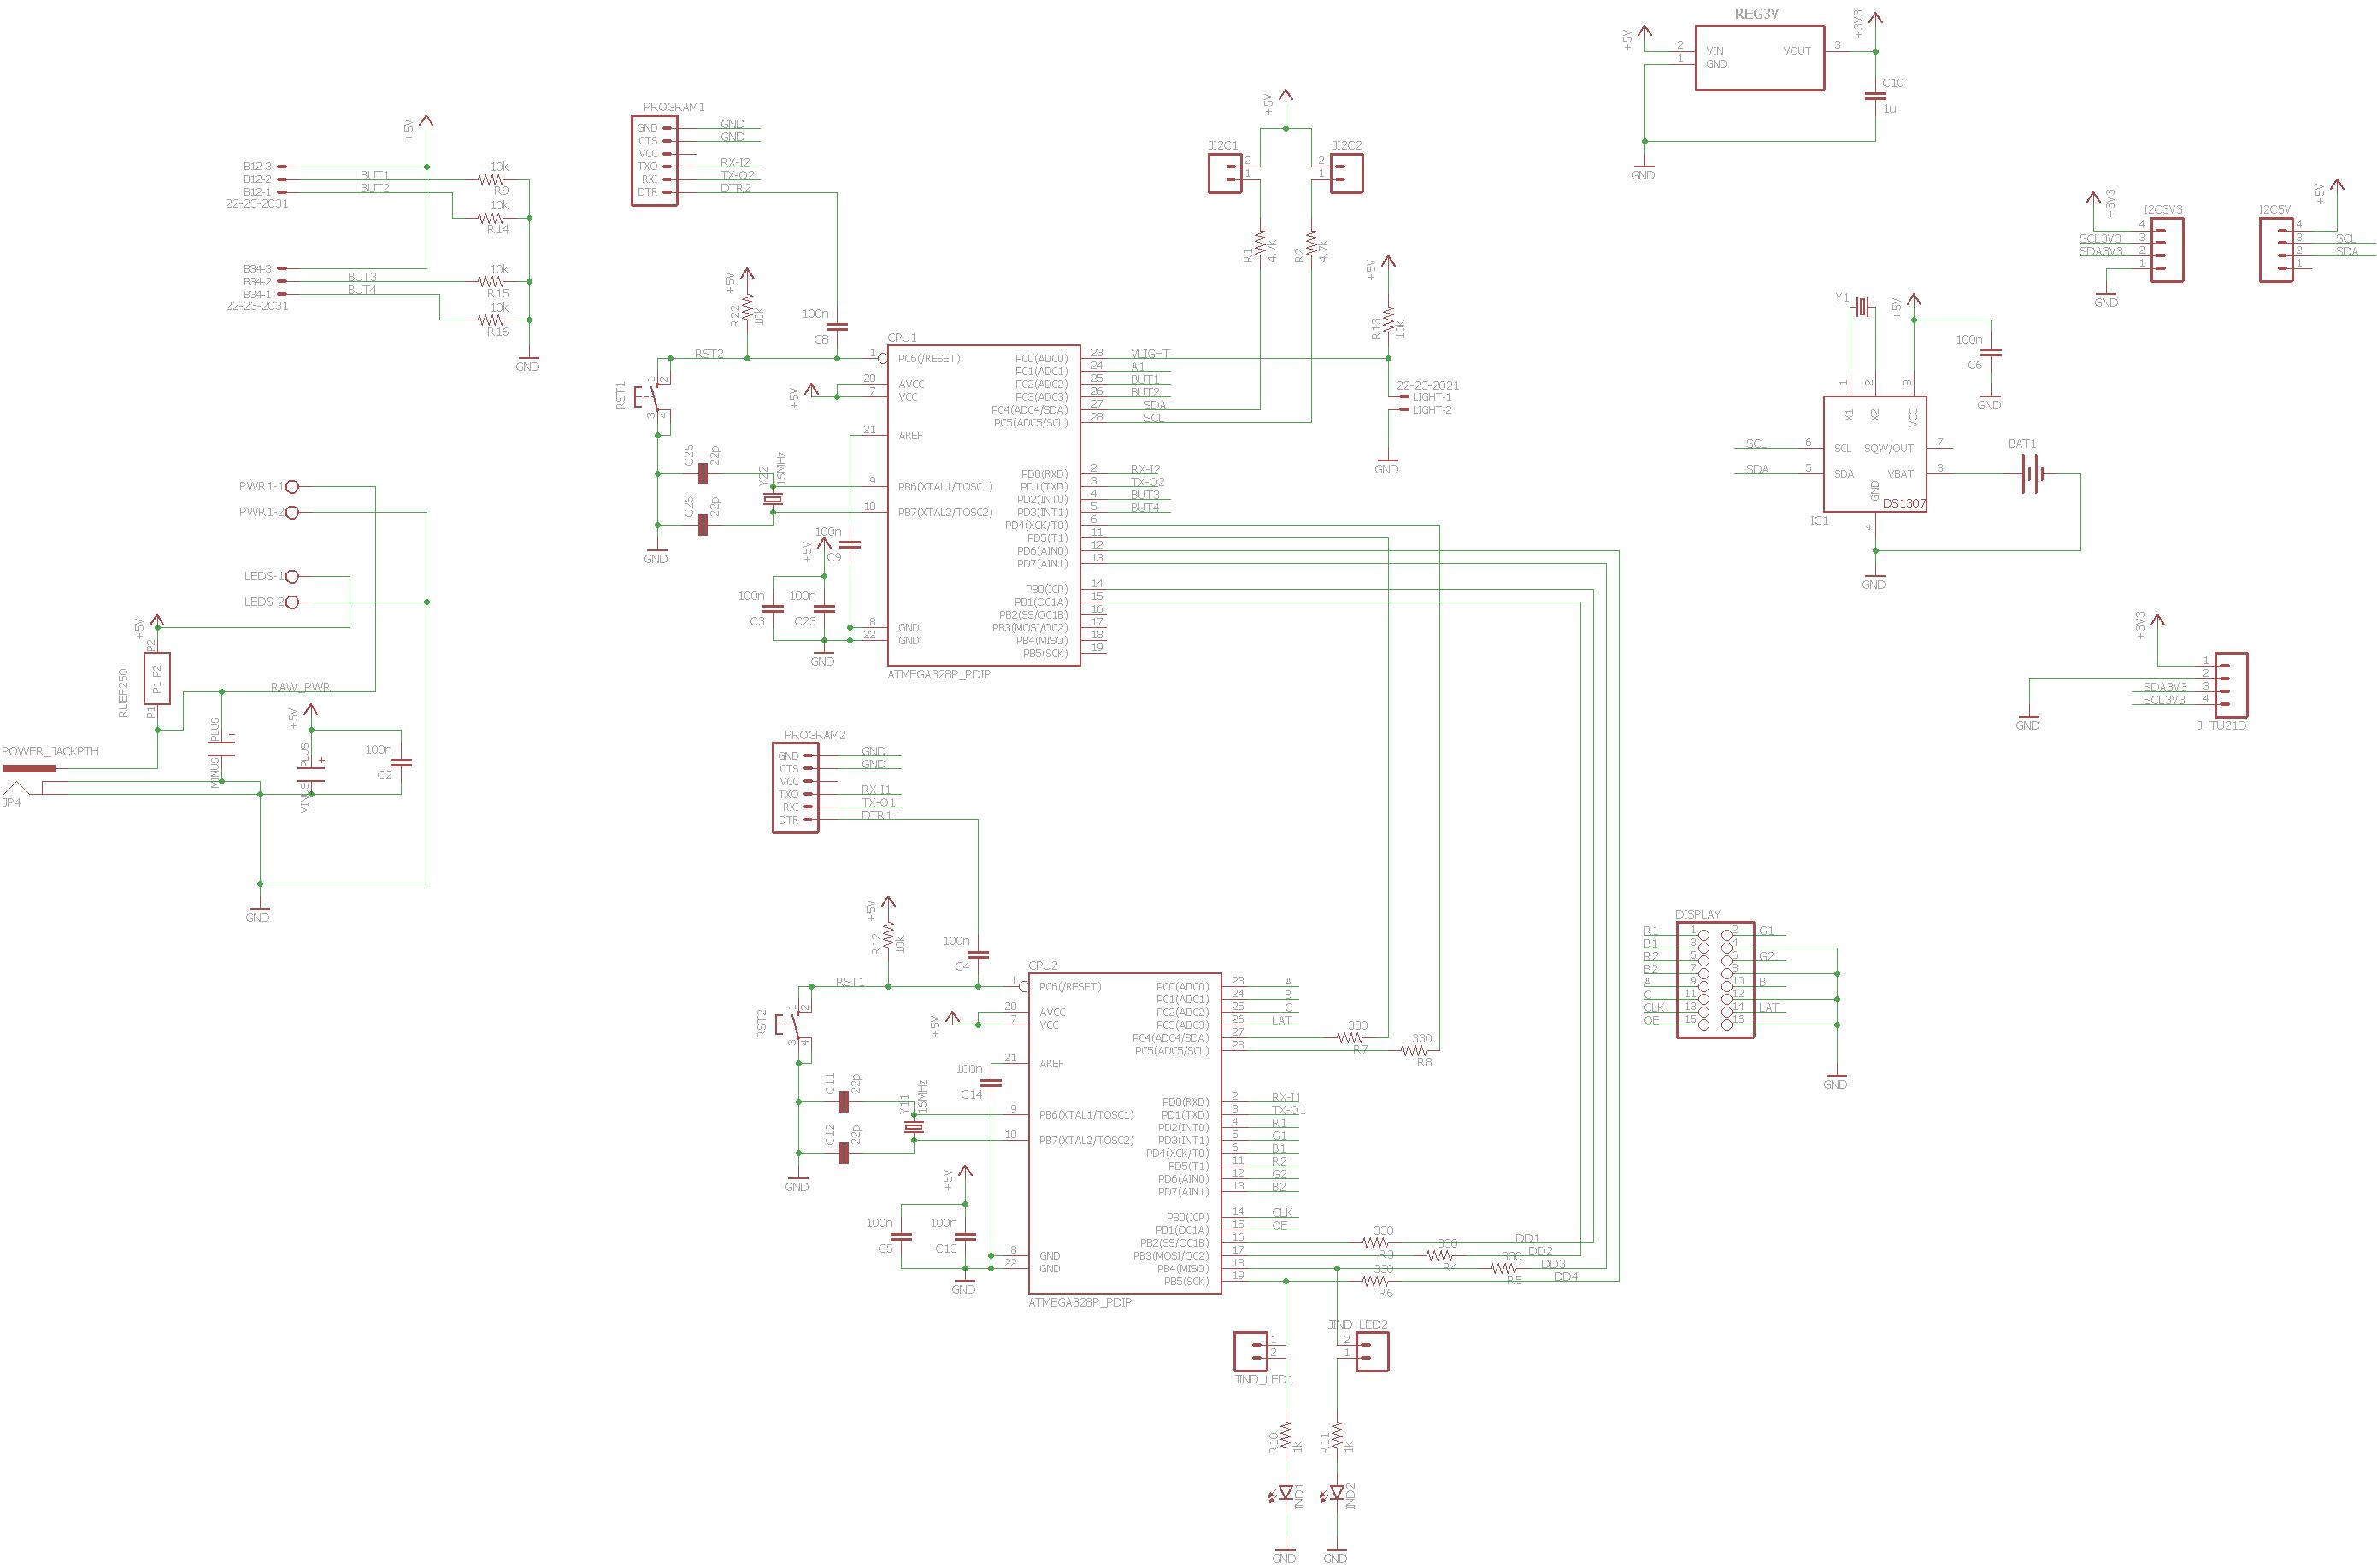 16x32 RGB LED Matrix Clock | Hackaday io